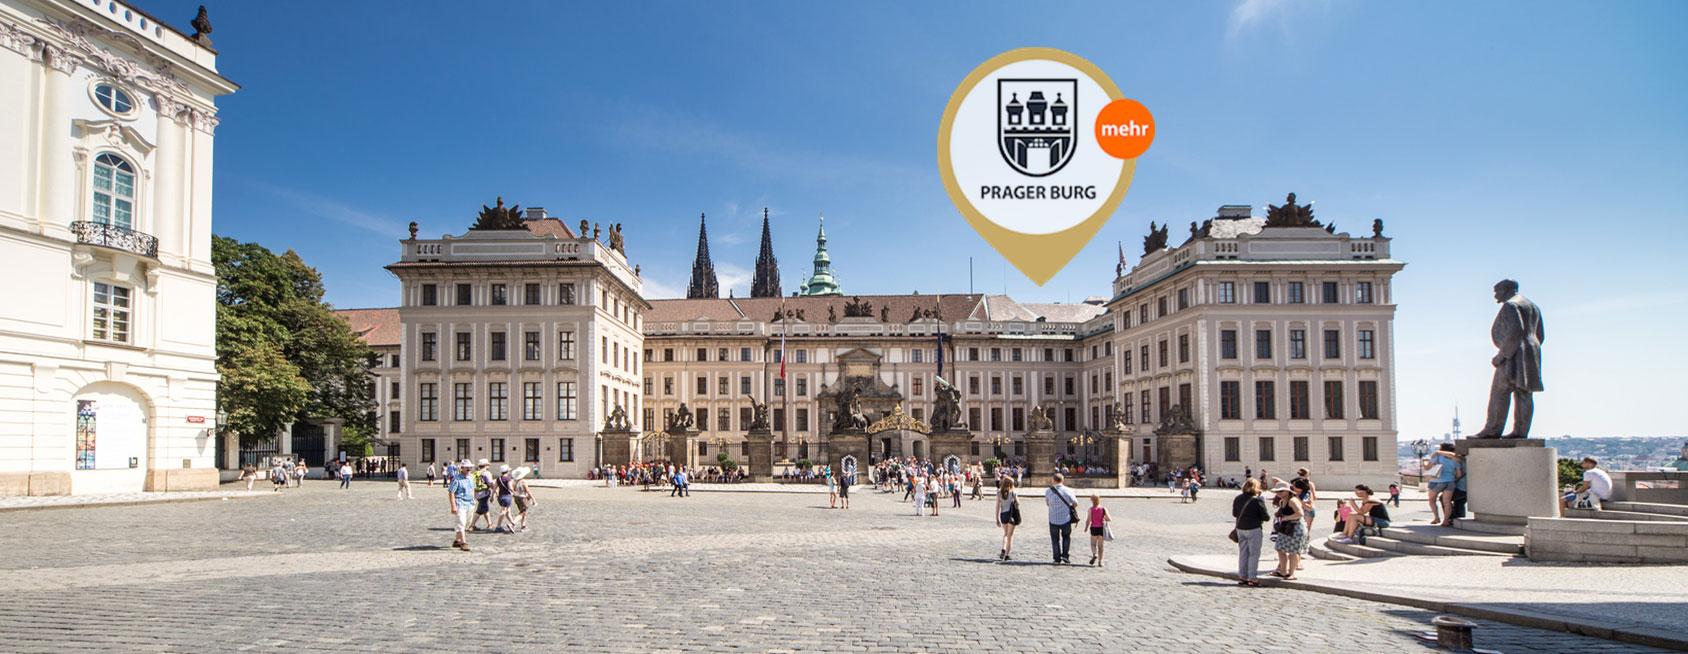 Prager-Burg_Icon